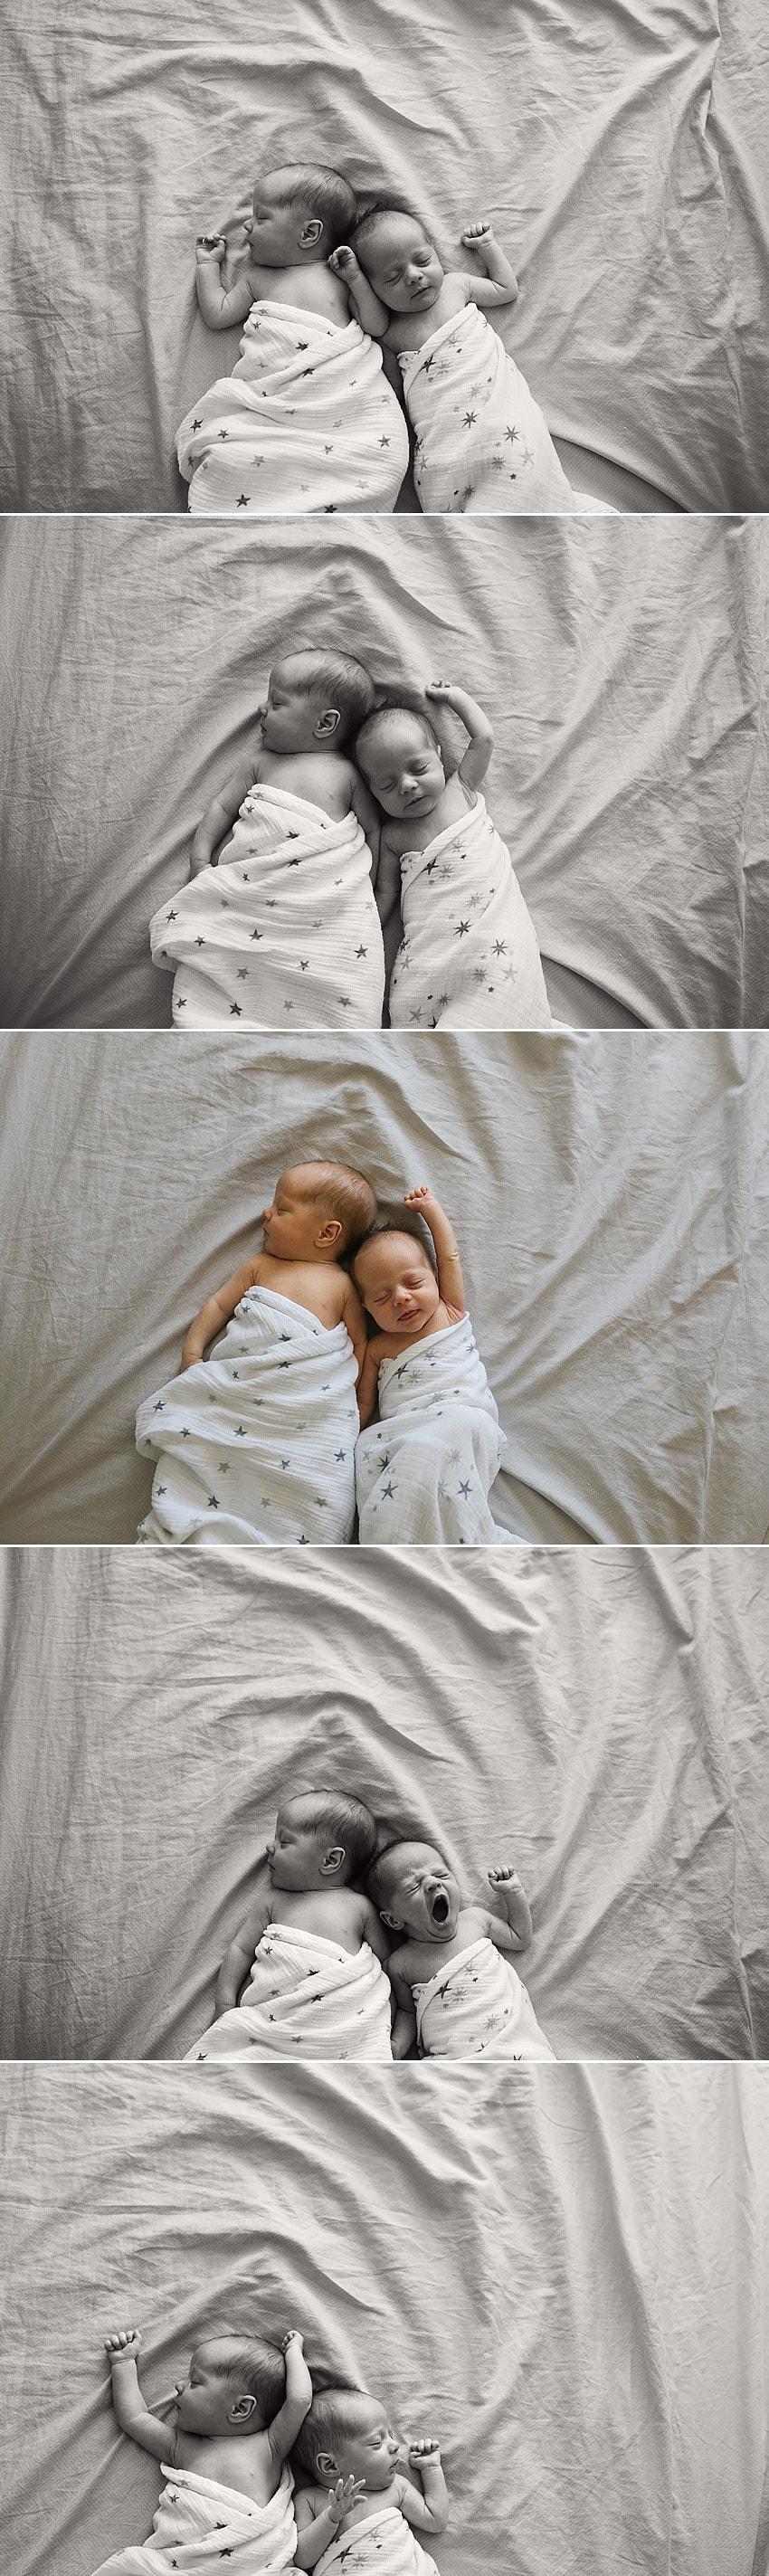 Newborn-twins-photography-sutherland-shire-sydney